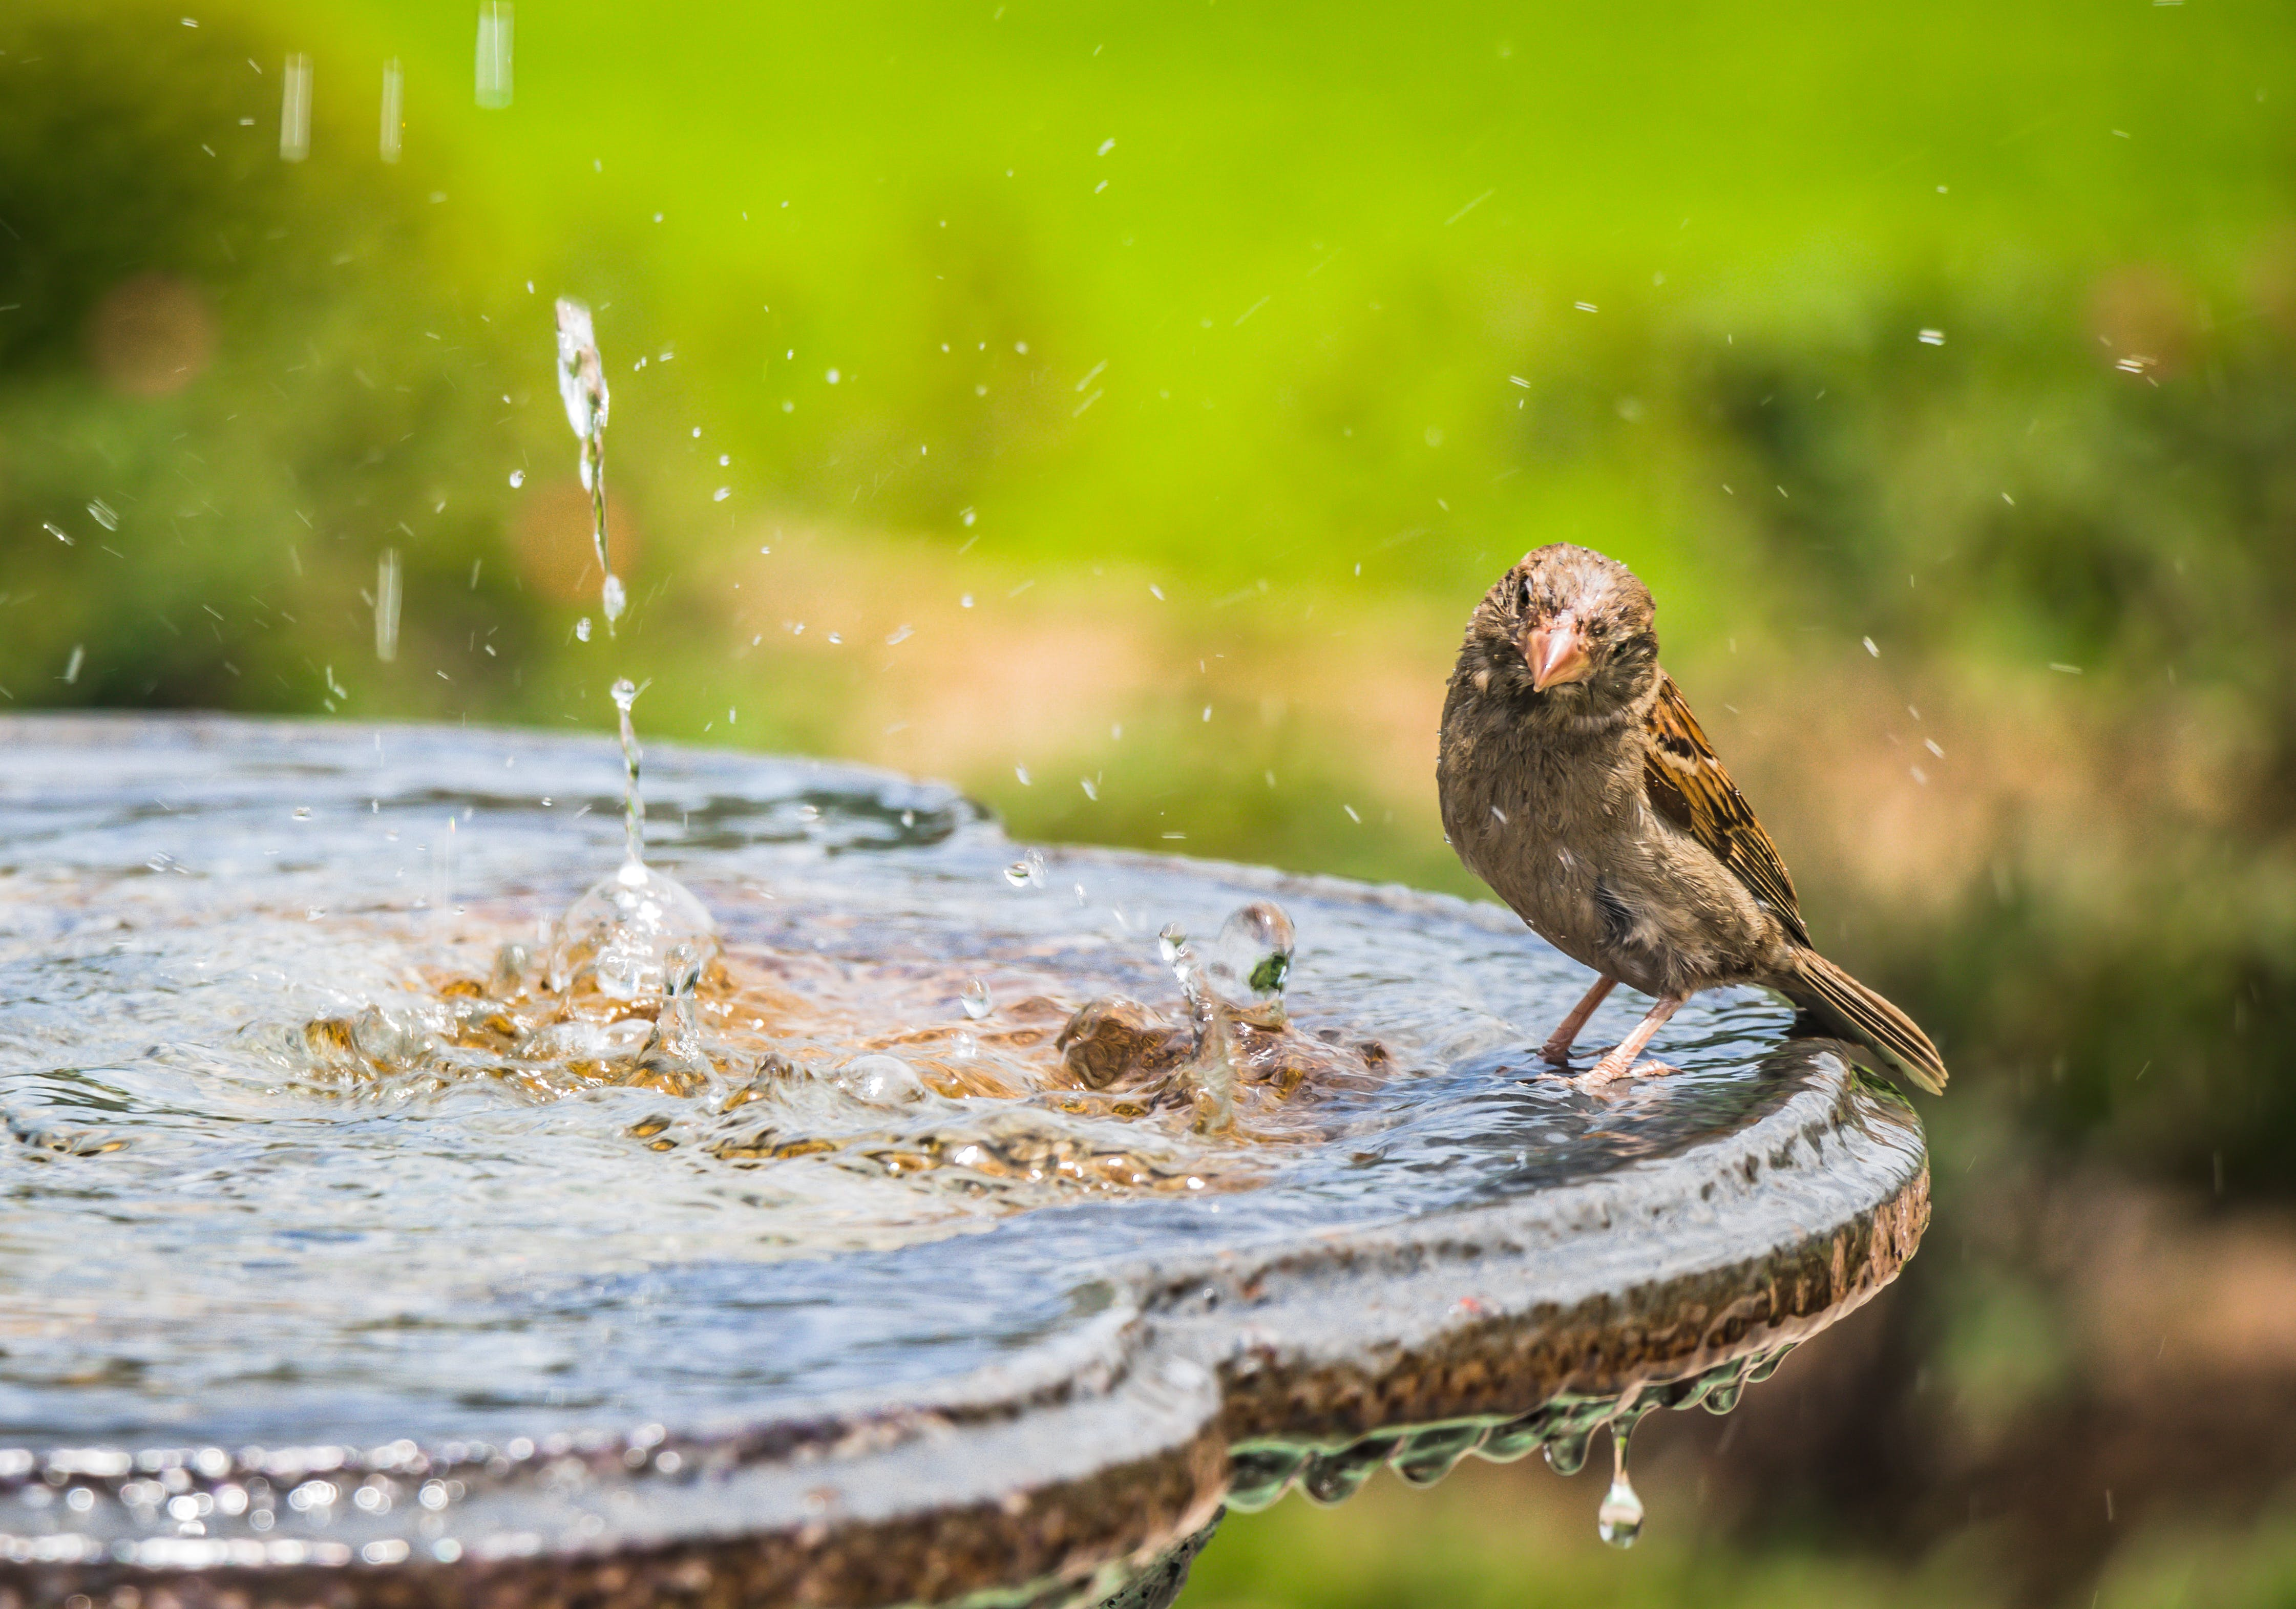 Shallow Focus Photography of Bird Standing on Bird Bath